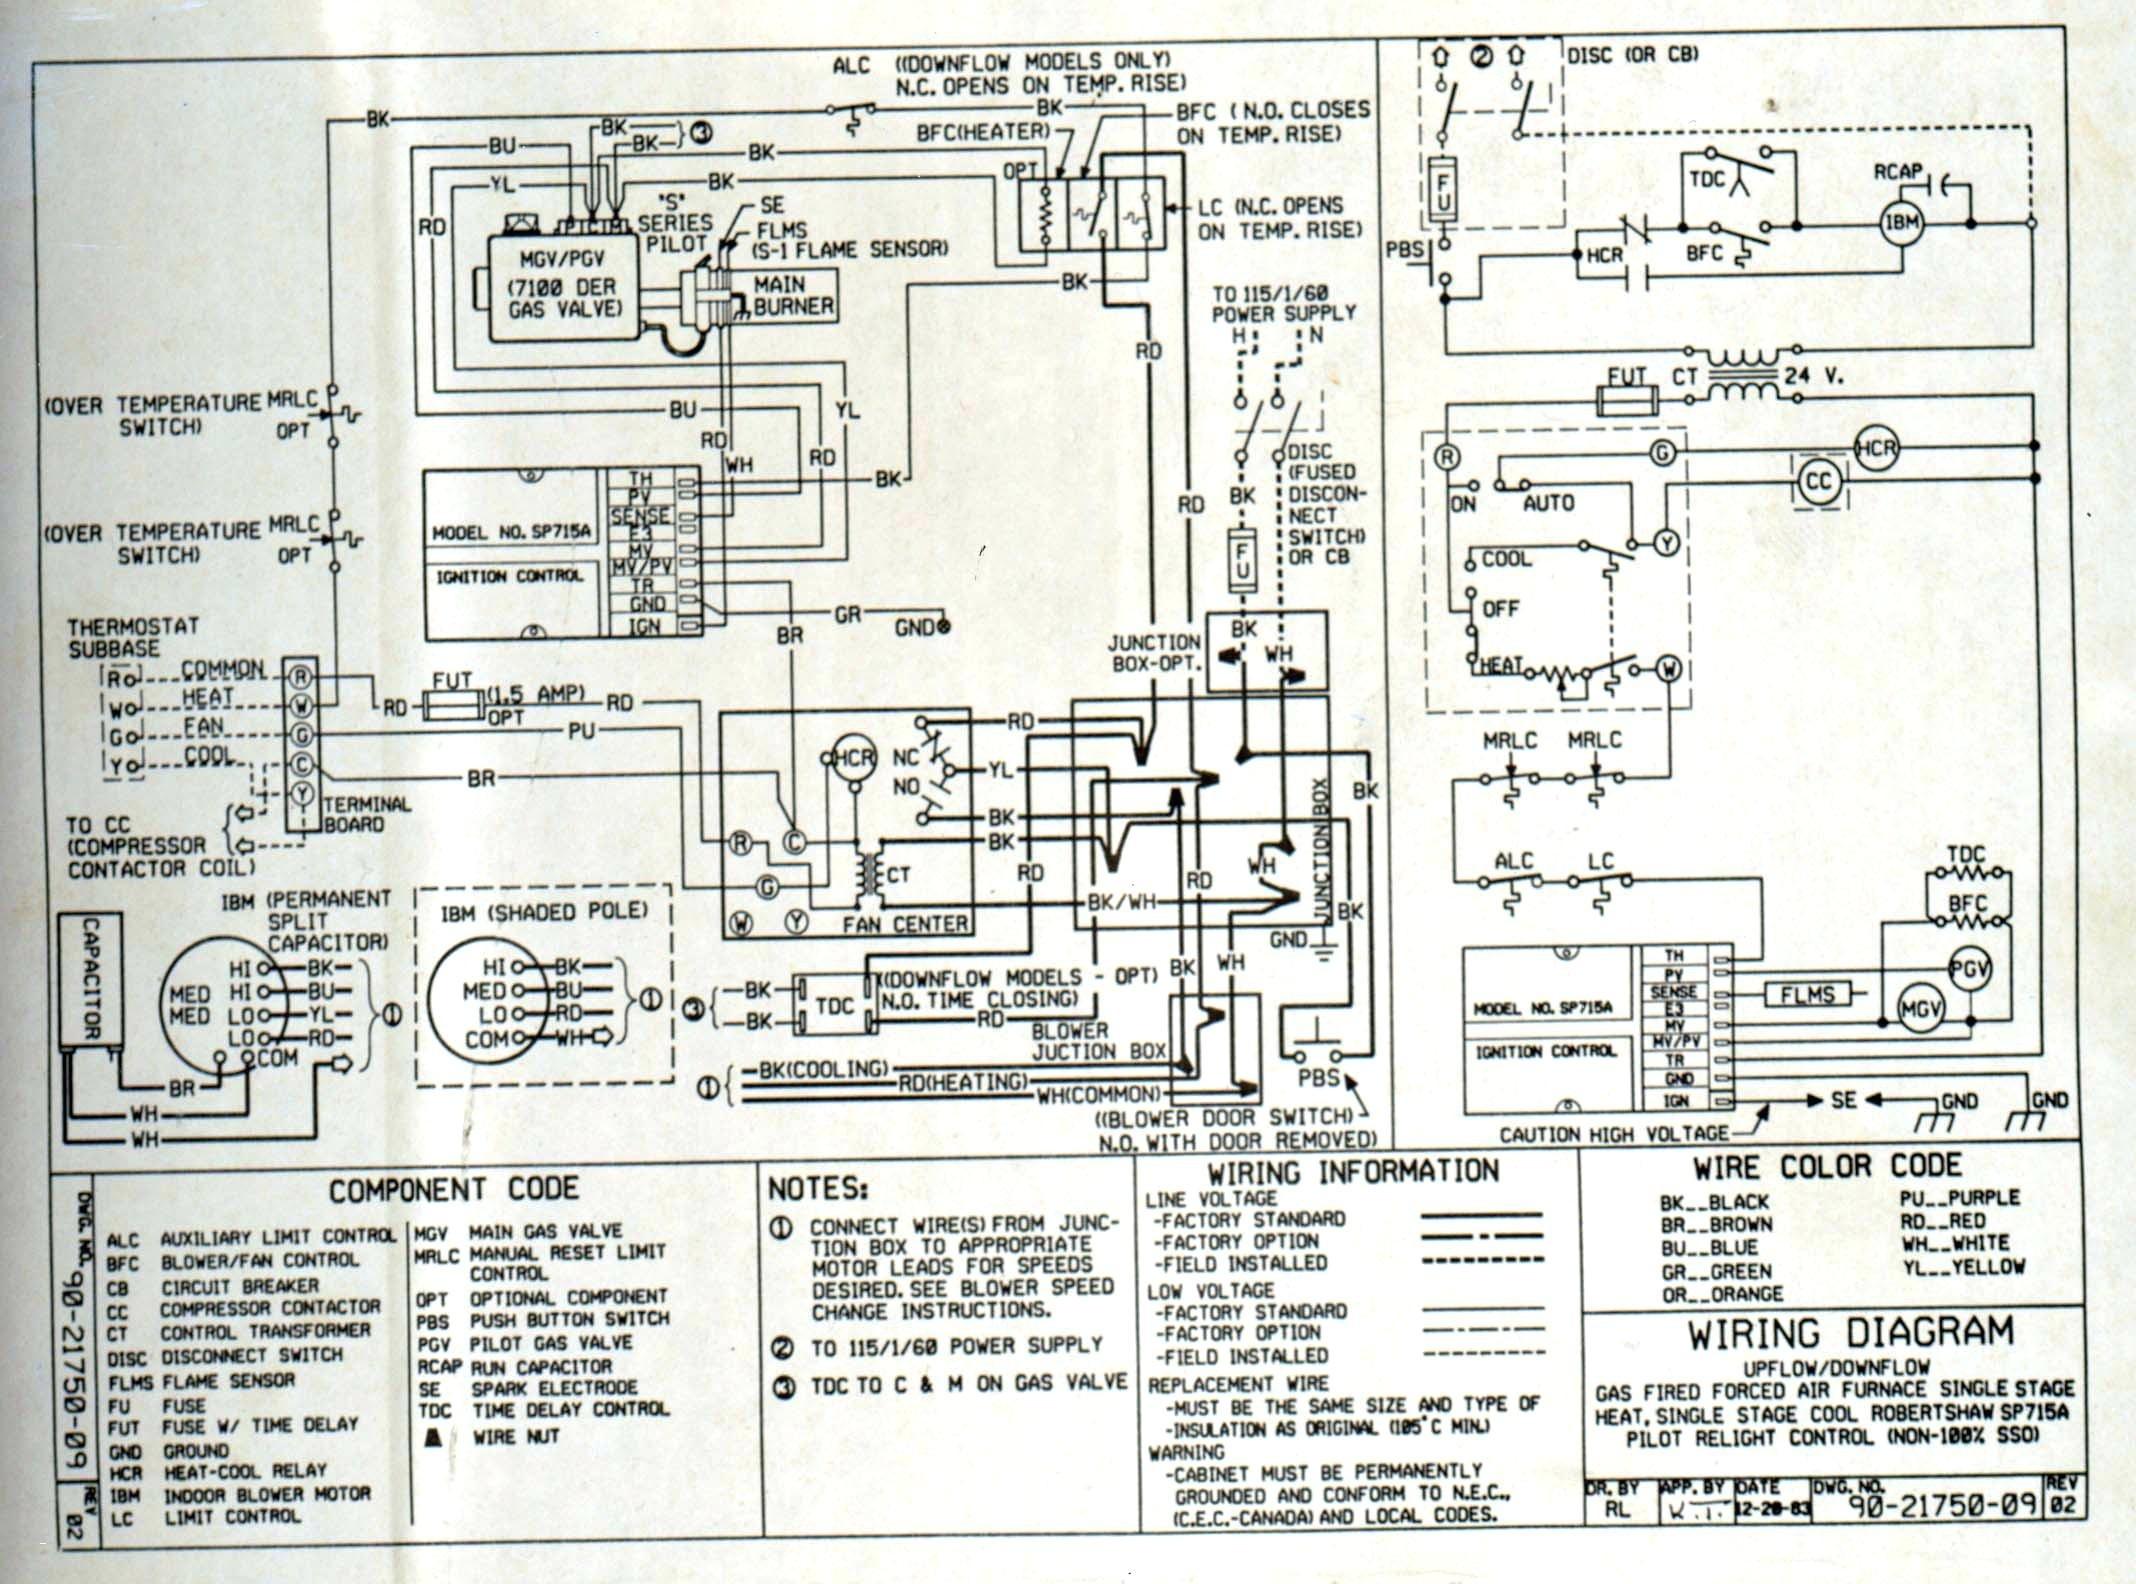 Carrier Heat Pump Wiring Diagram Goodman Air Handler Wiring Diagram Unique Wiring Diagram Goodman Of Carrier Heat Pump Wiring Diagram